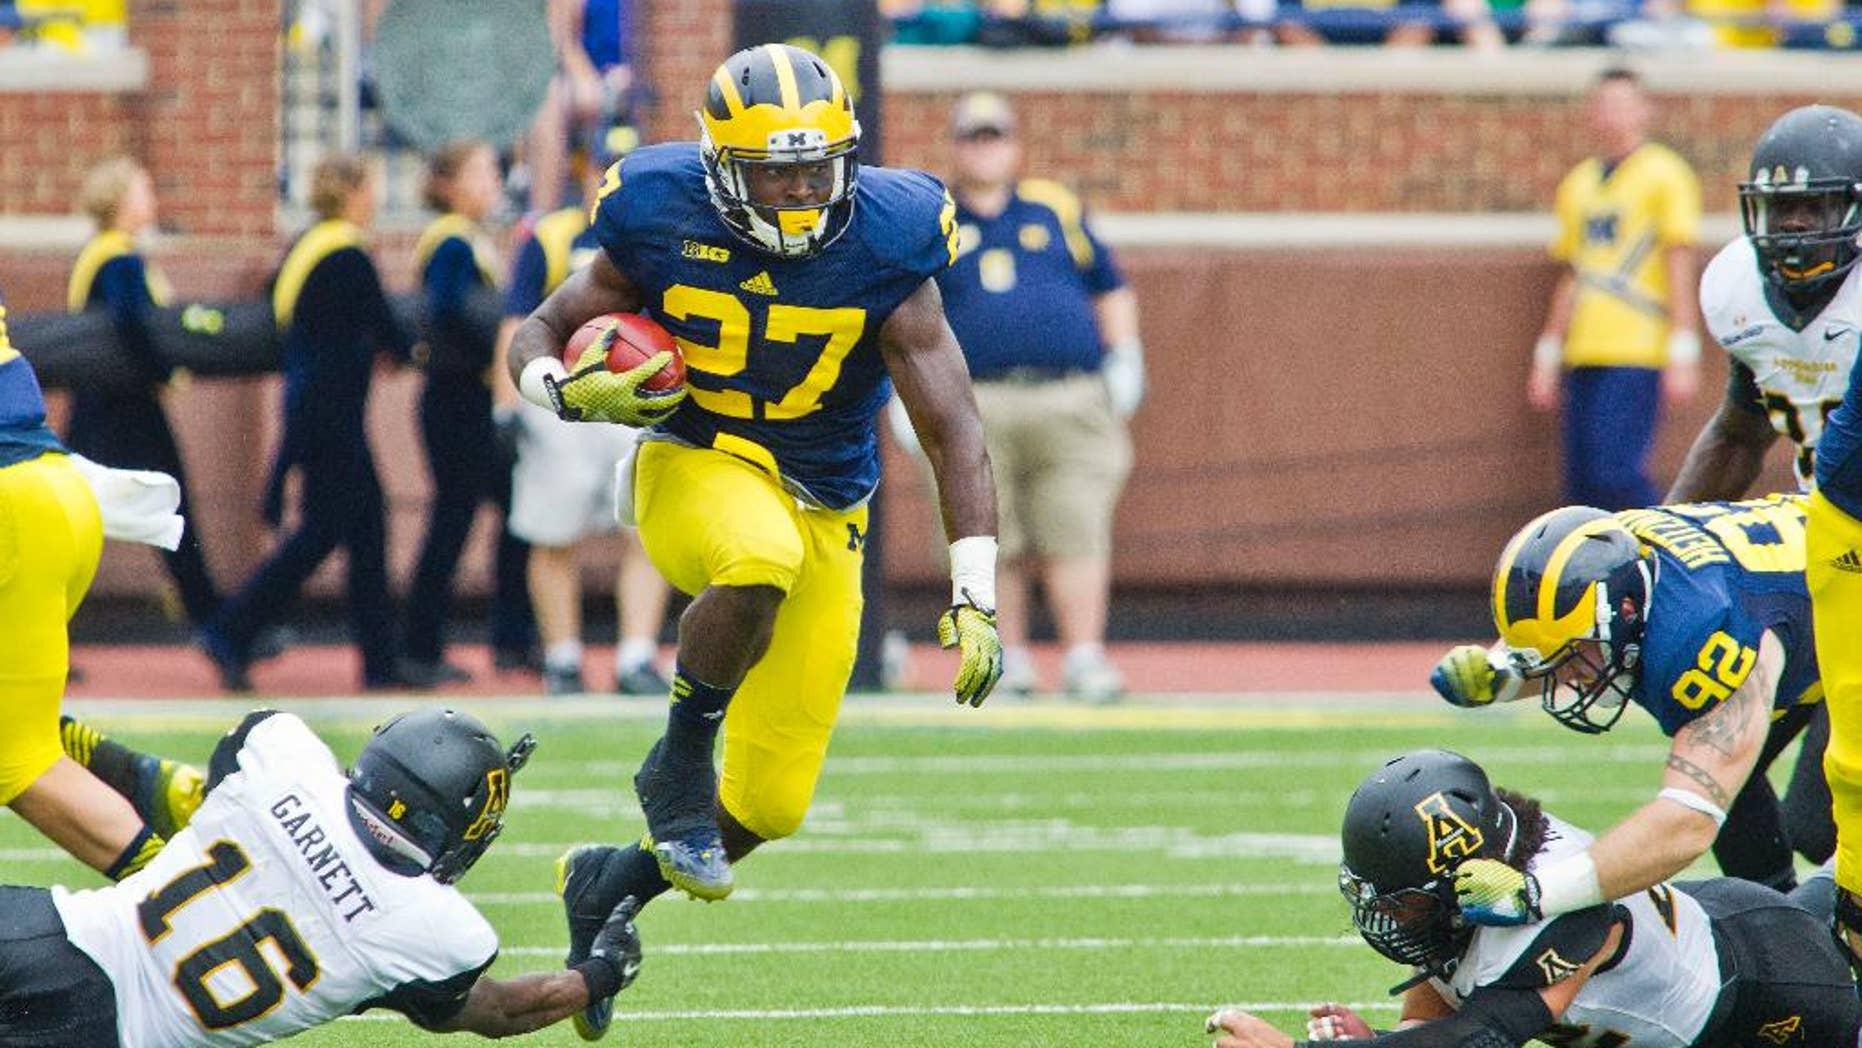 Appalachian State defensive back Treyon Garnett (16) fails to stop Michigan running back Derrick Green (27) in the third quarter of an NCAA college football game in Ann Arbor, Mich., Saturday, Aug. 30, 2014. Michigan won 52-14. (AP Photo/Tony Ding)